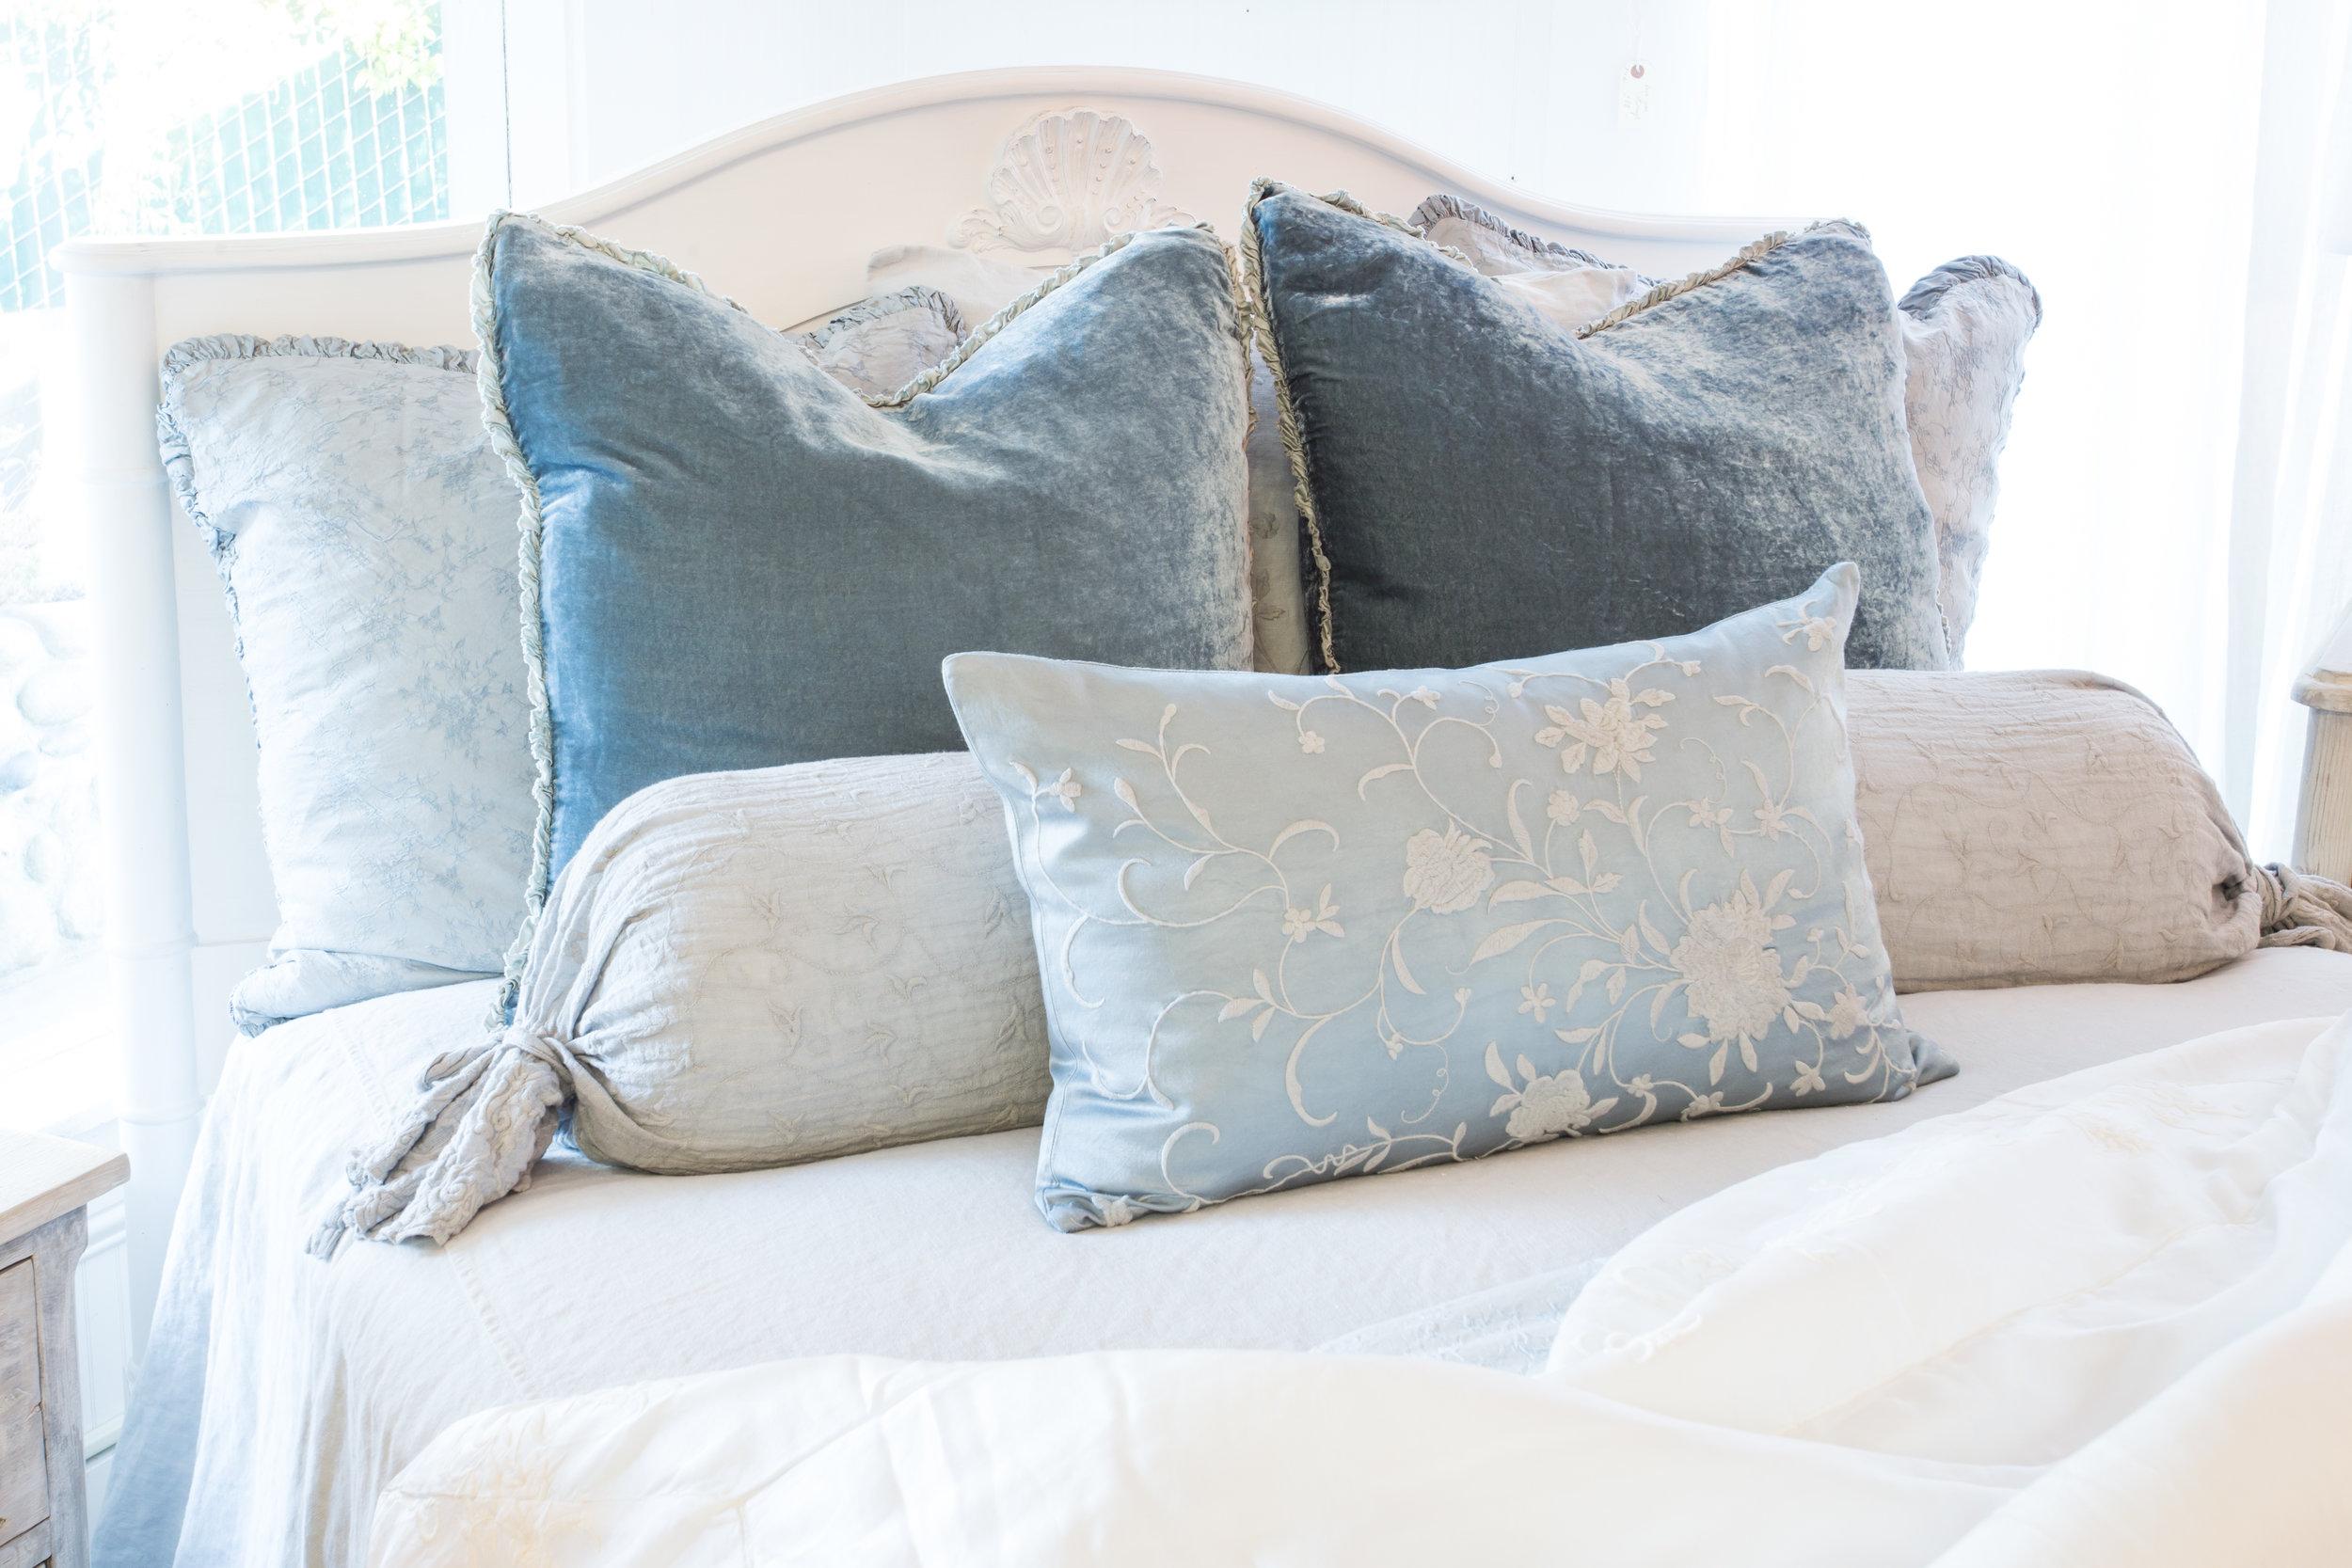 Luxury soft bedding